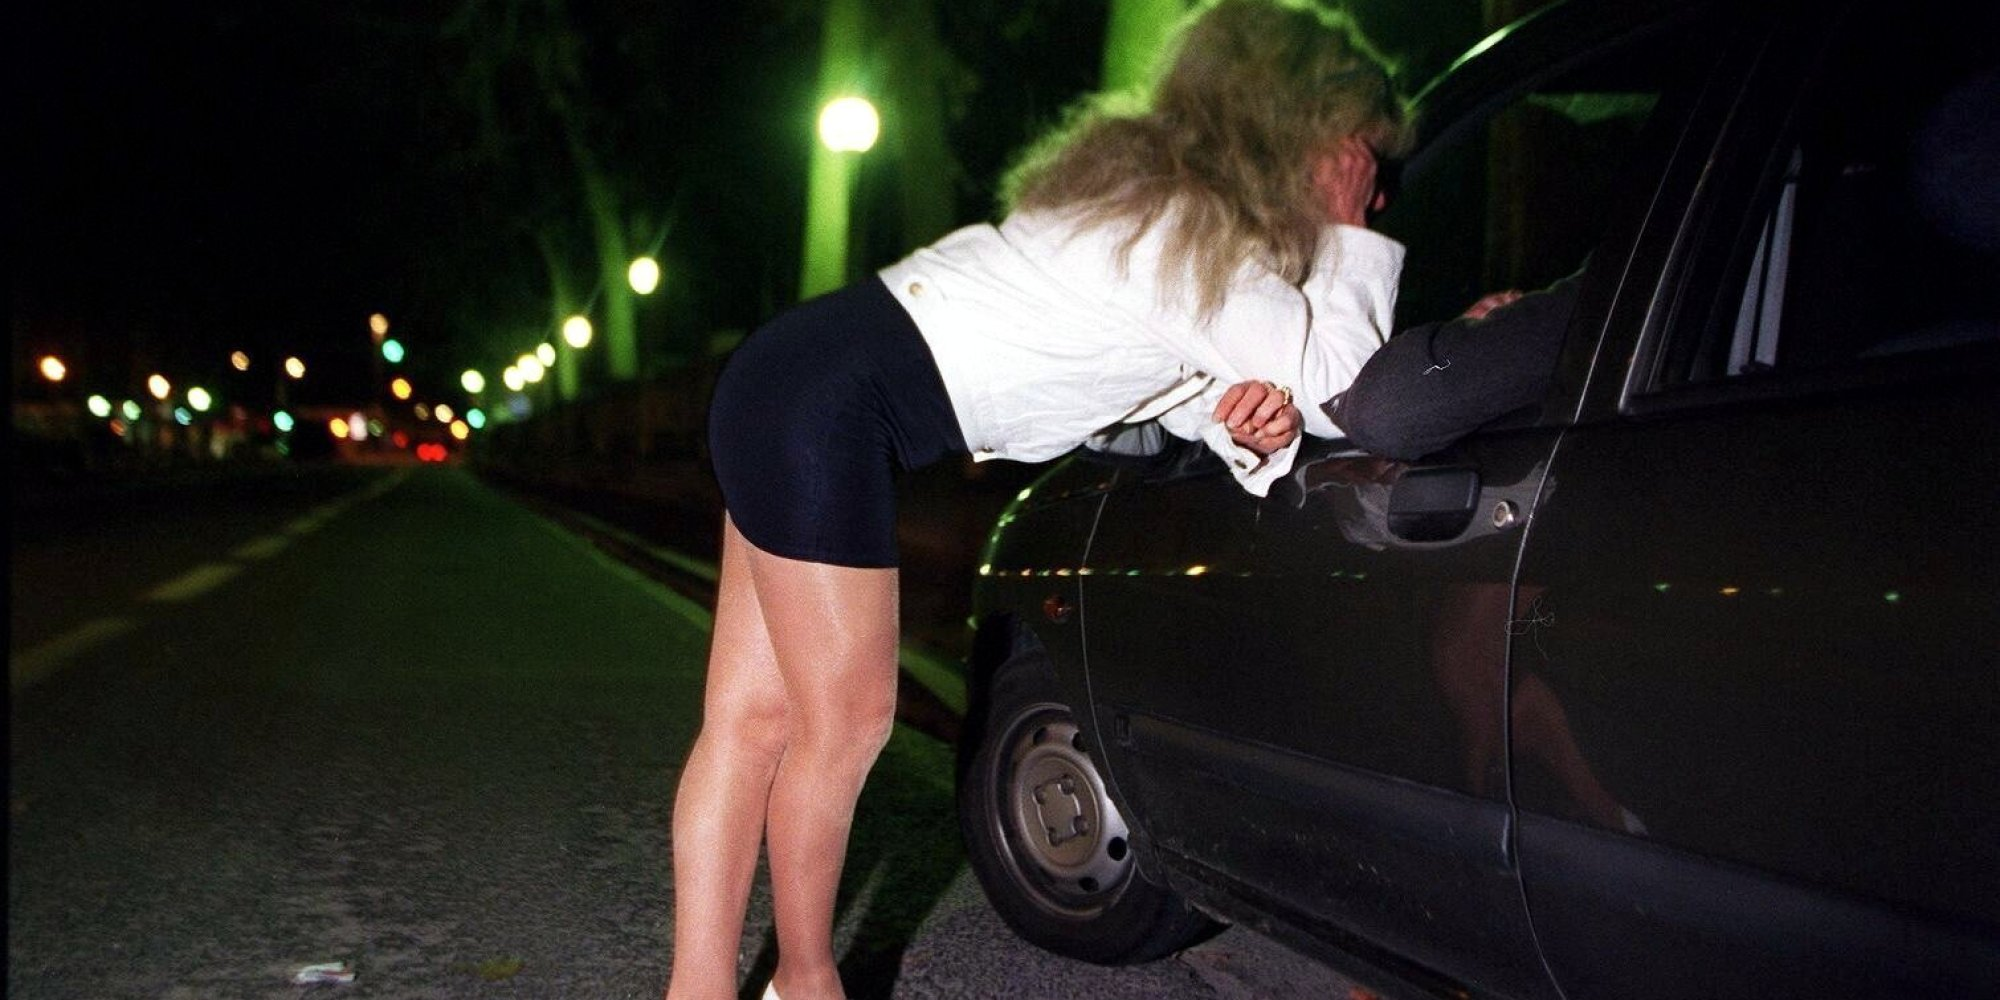 ella prostituierte prostituierte in mg